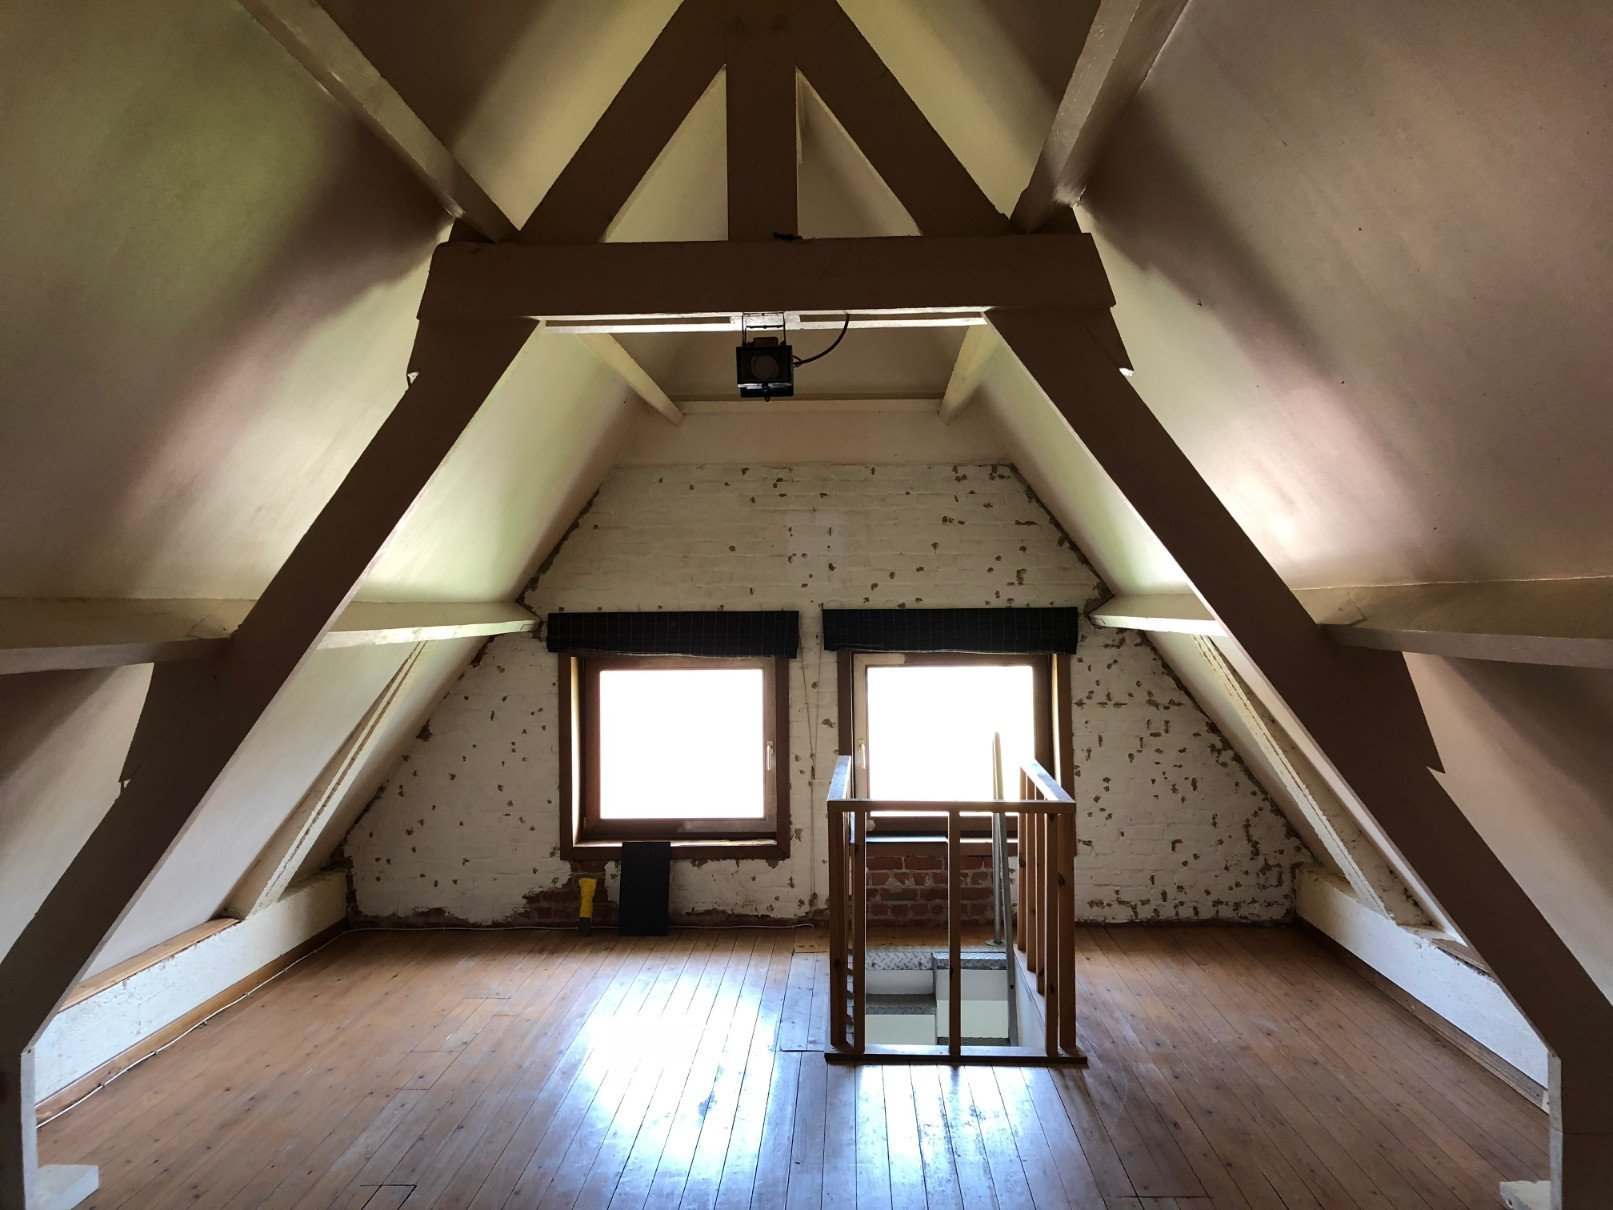 Rietveldprojects-Villa Were Di - Te Koop : Te Huur (per week)17